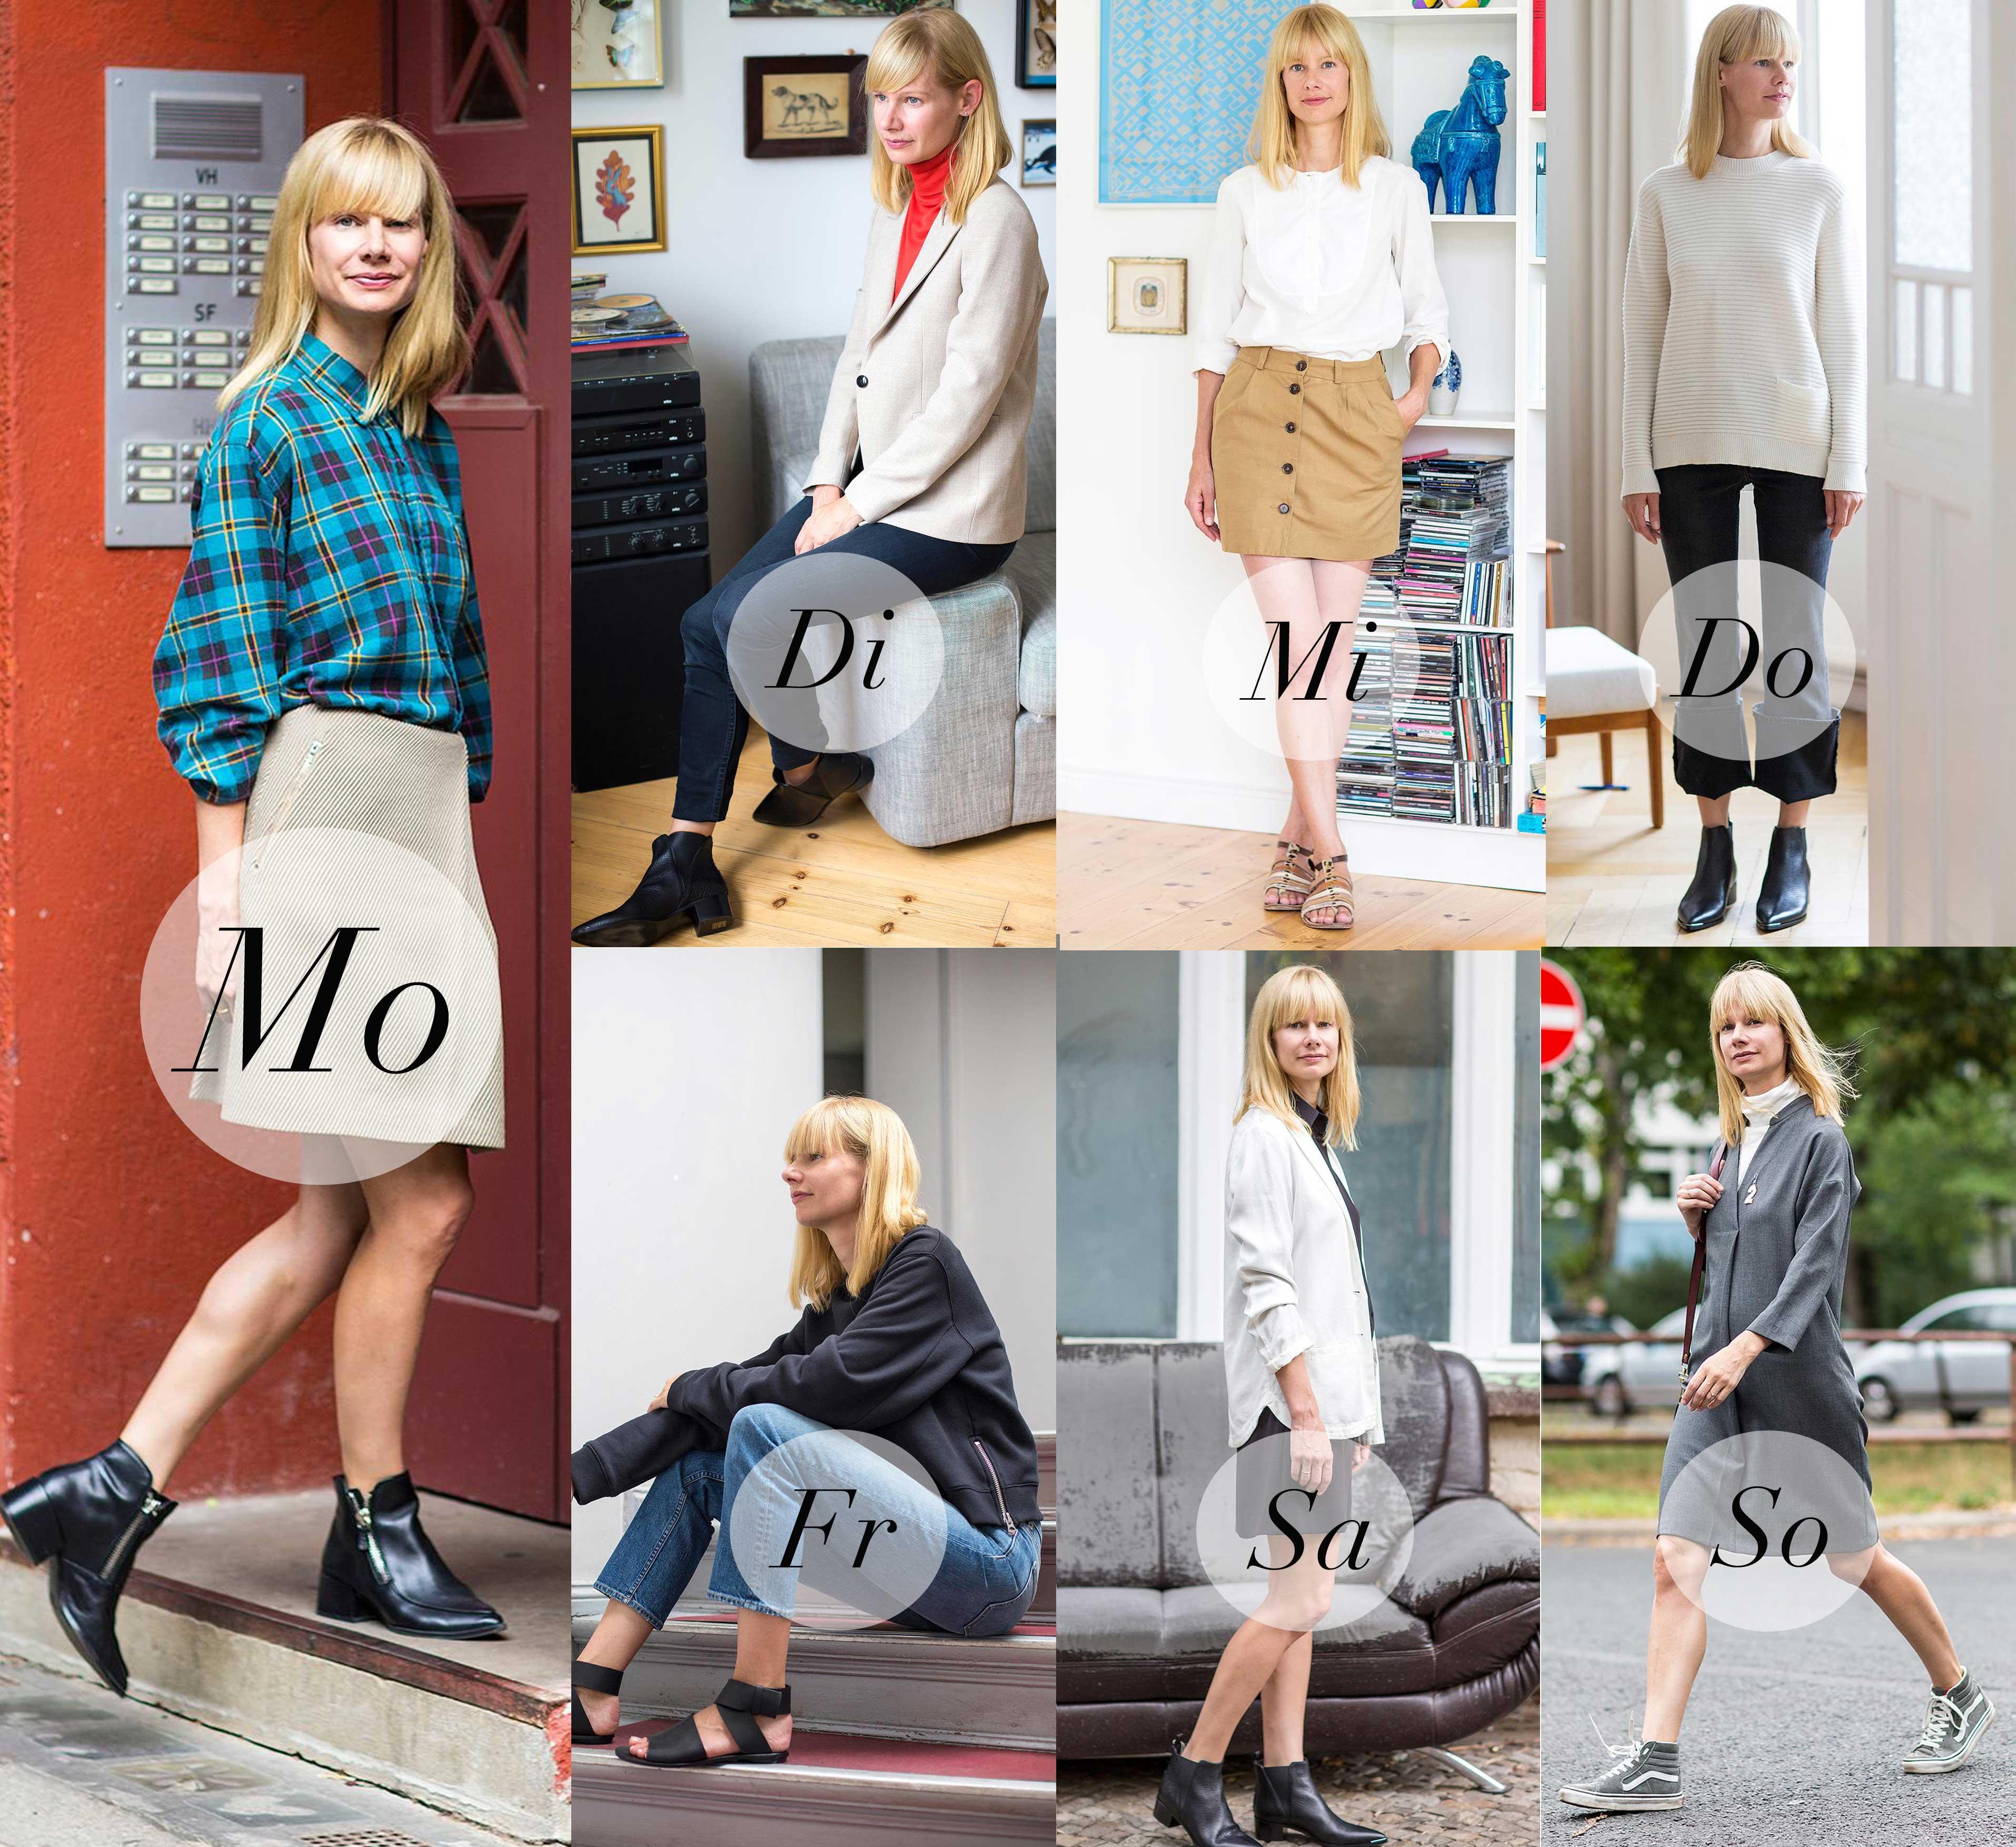 Vans Schuhe Archive Mode Blog Berlin Blogazine Fashion